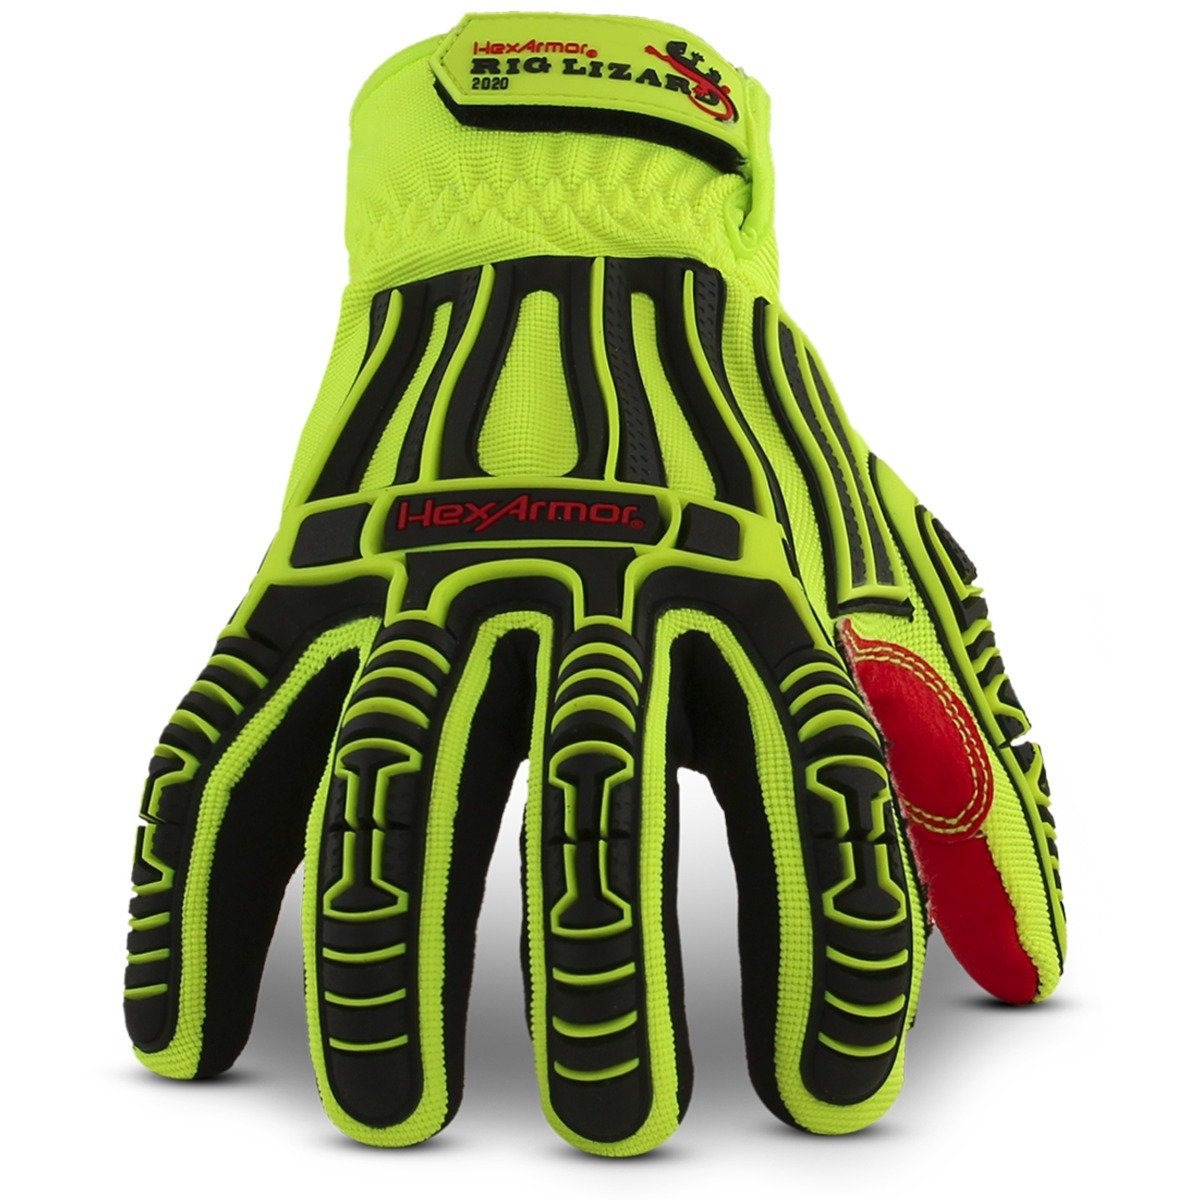 HexArmor Rig Lizard 2020 Firm Grip Impact Work Gloves 3X-Large